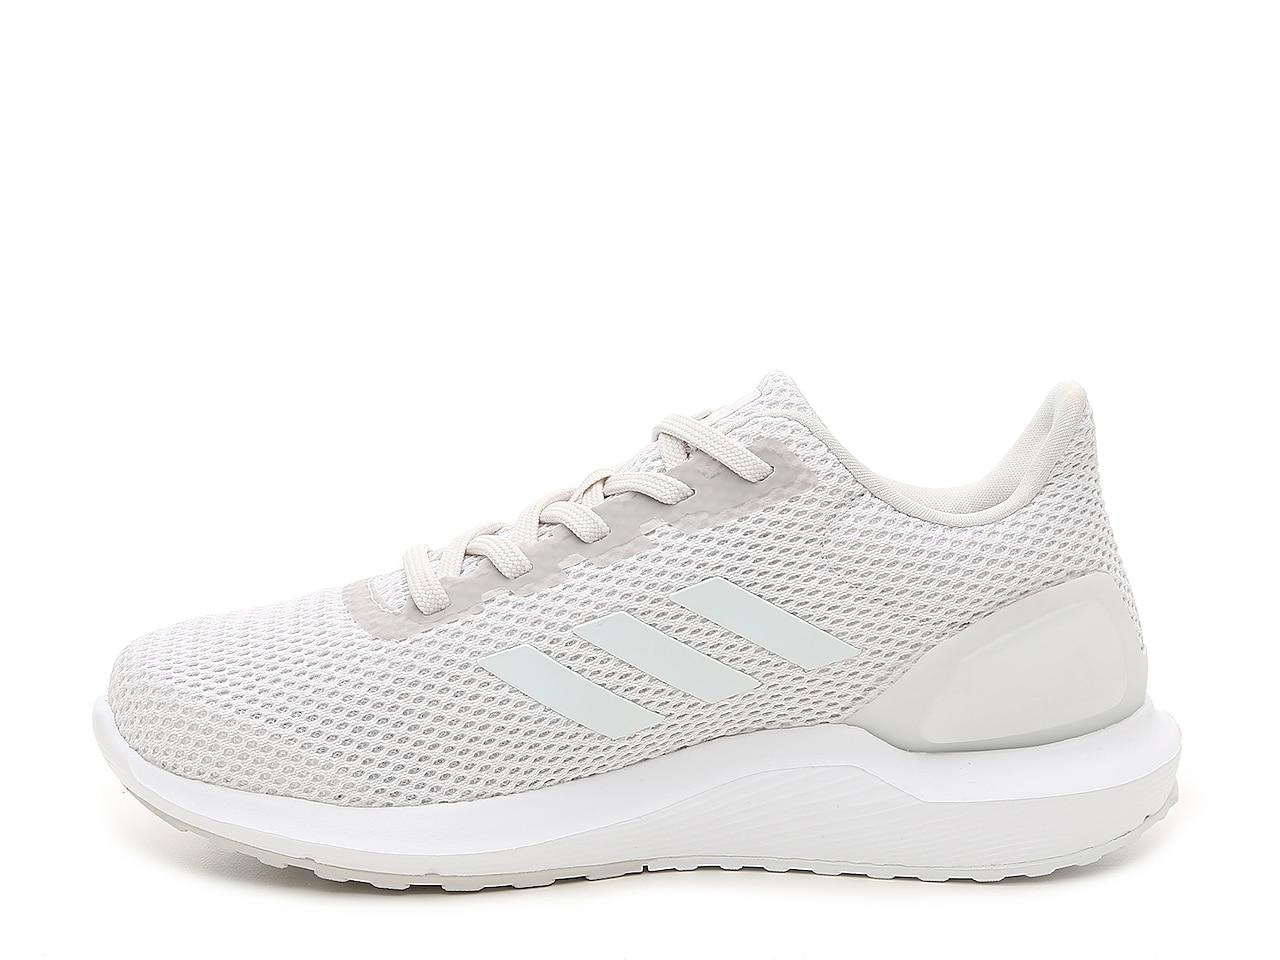 matriz Brillar Supone  adidas Cosmic 2 Running Shoe - Women's Women's Shoes | DSW